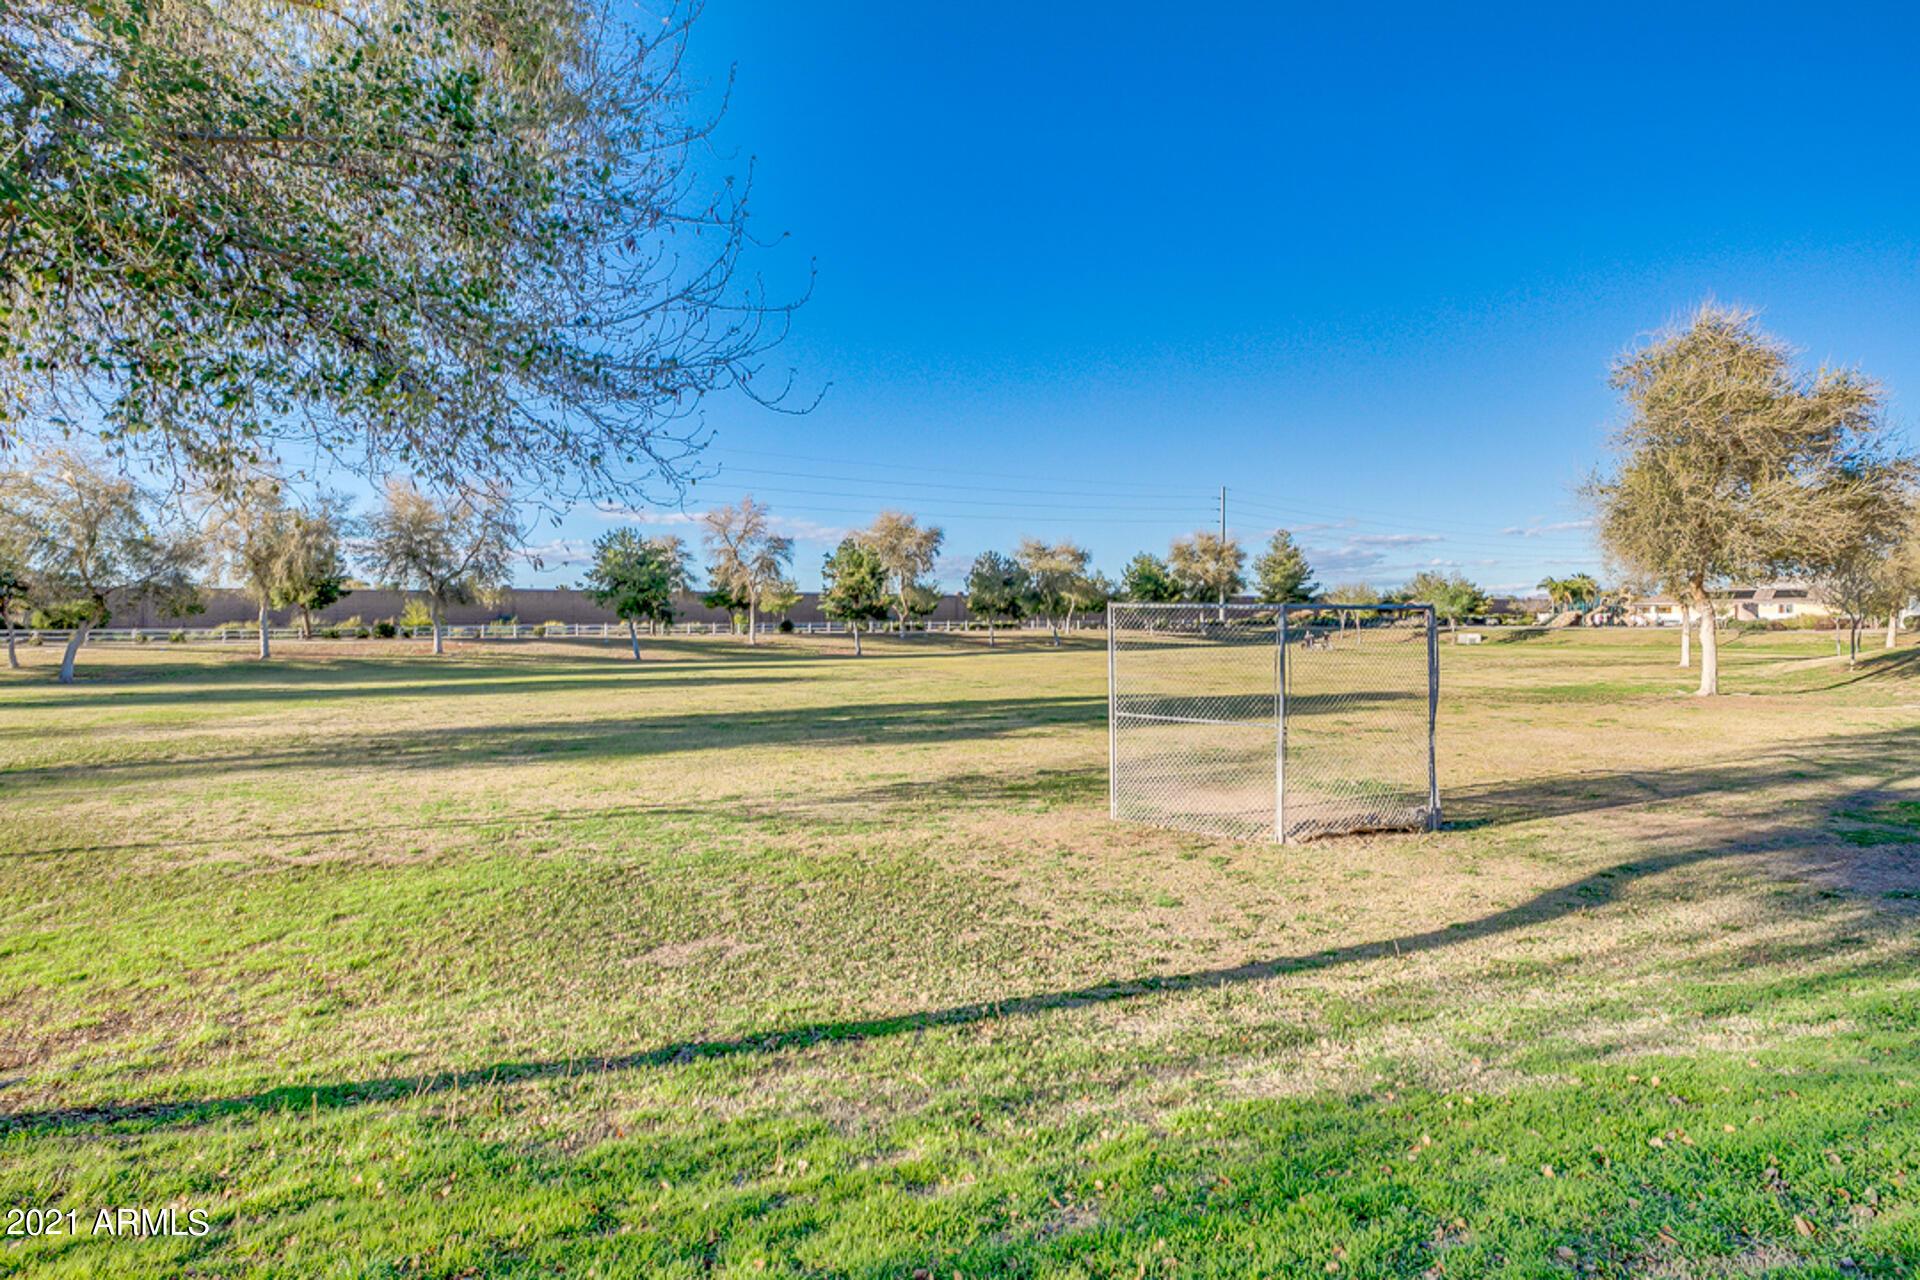 MLS 6307909 3123 E HOBART Street, Gilbert, AZ 85296 Agritopia